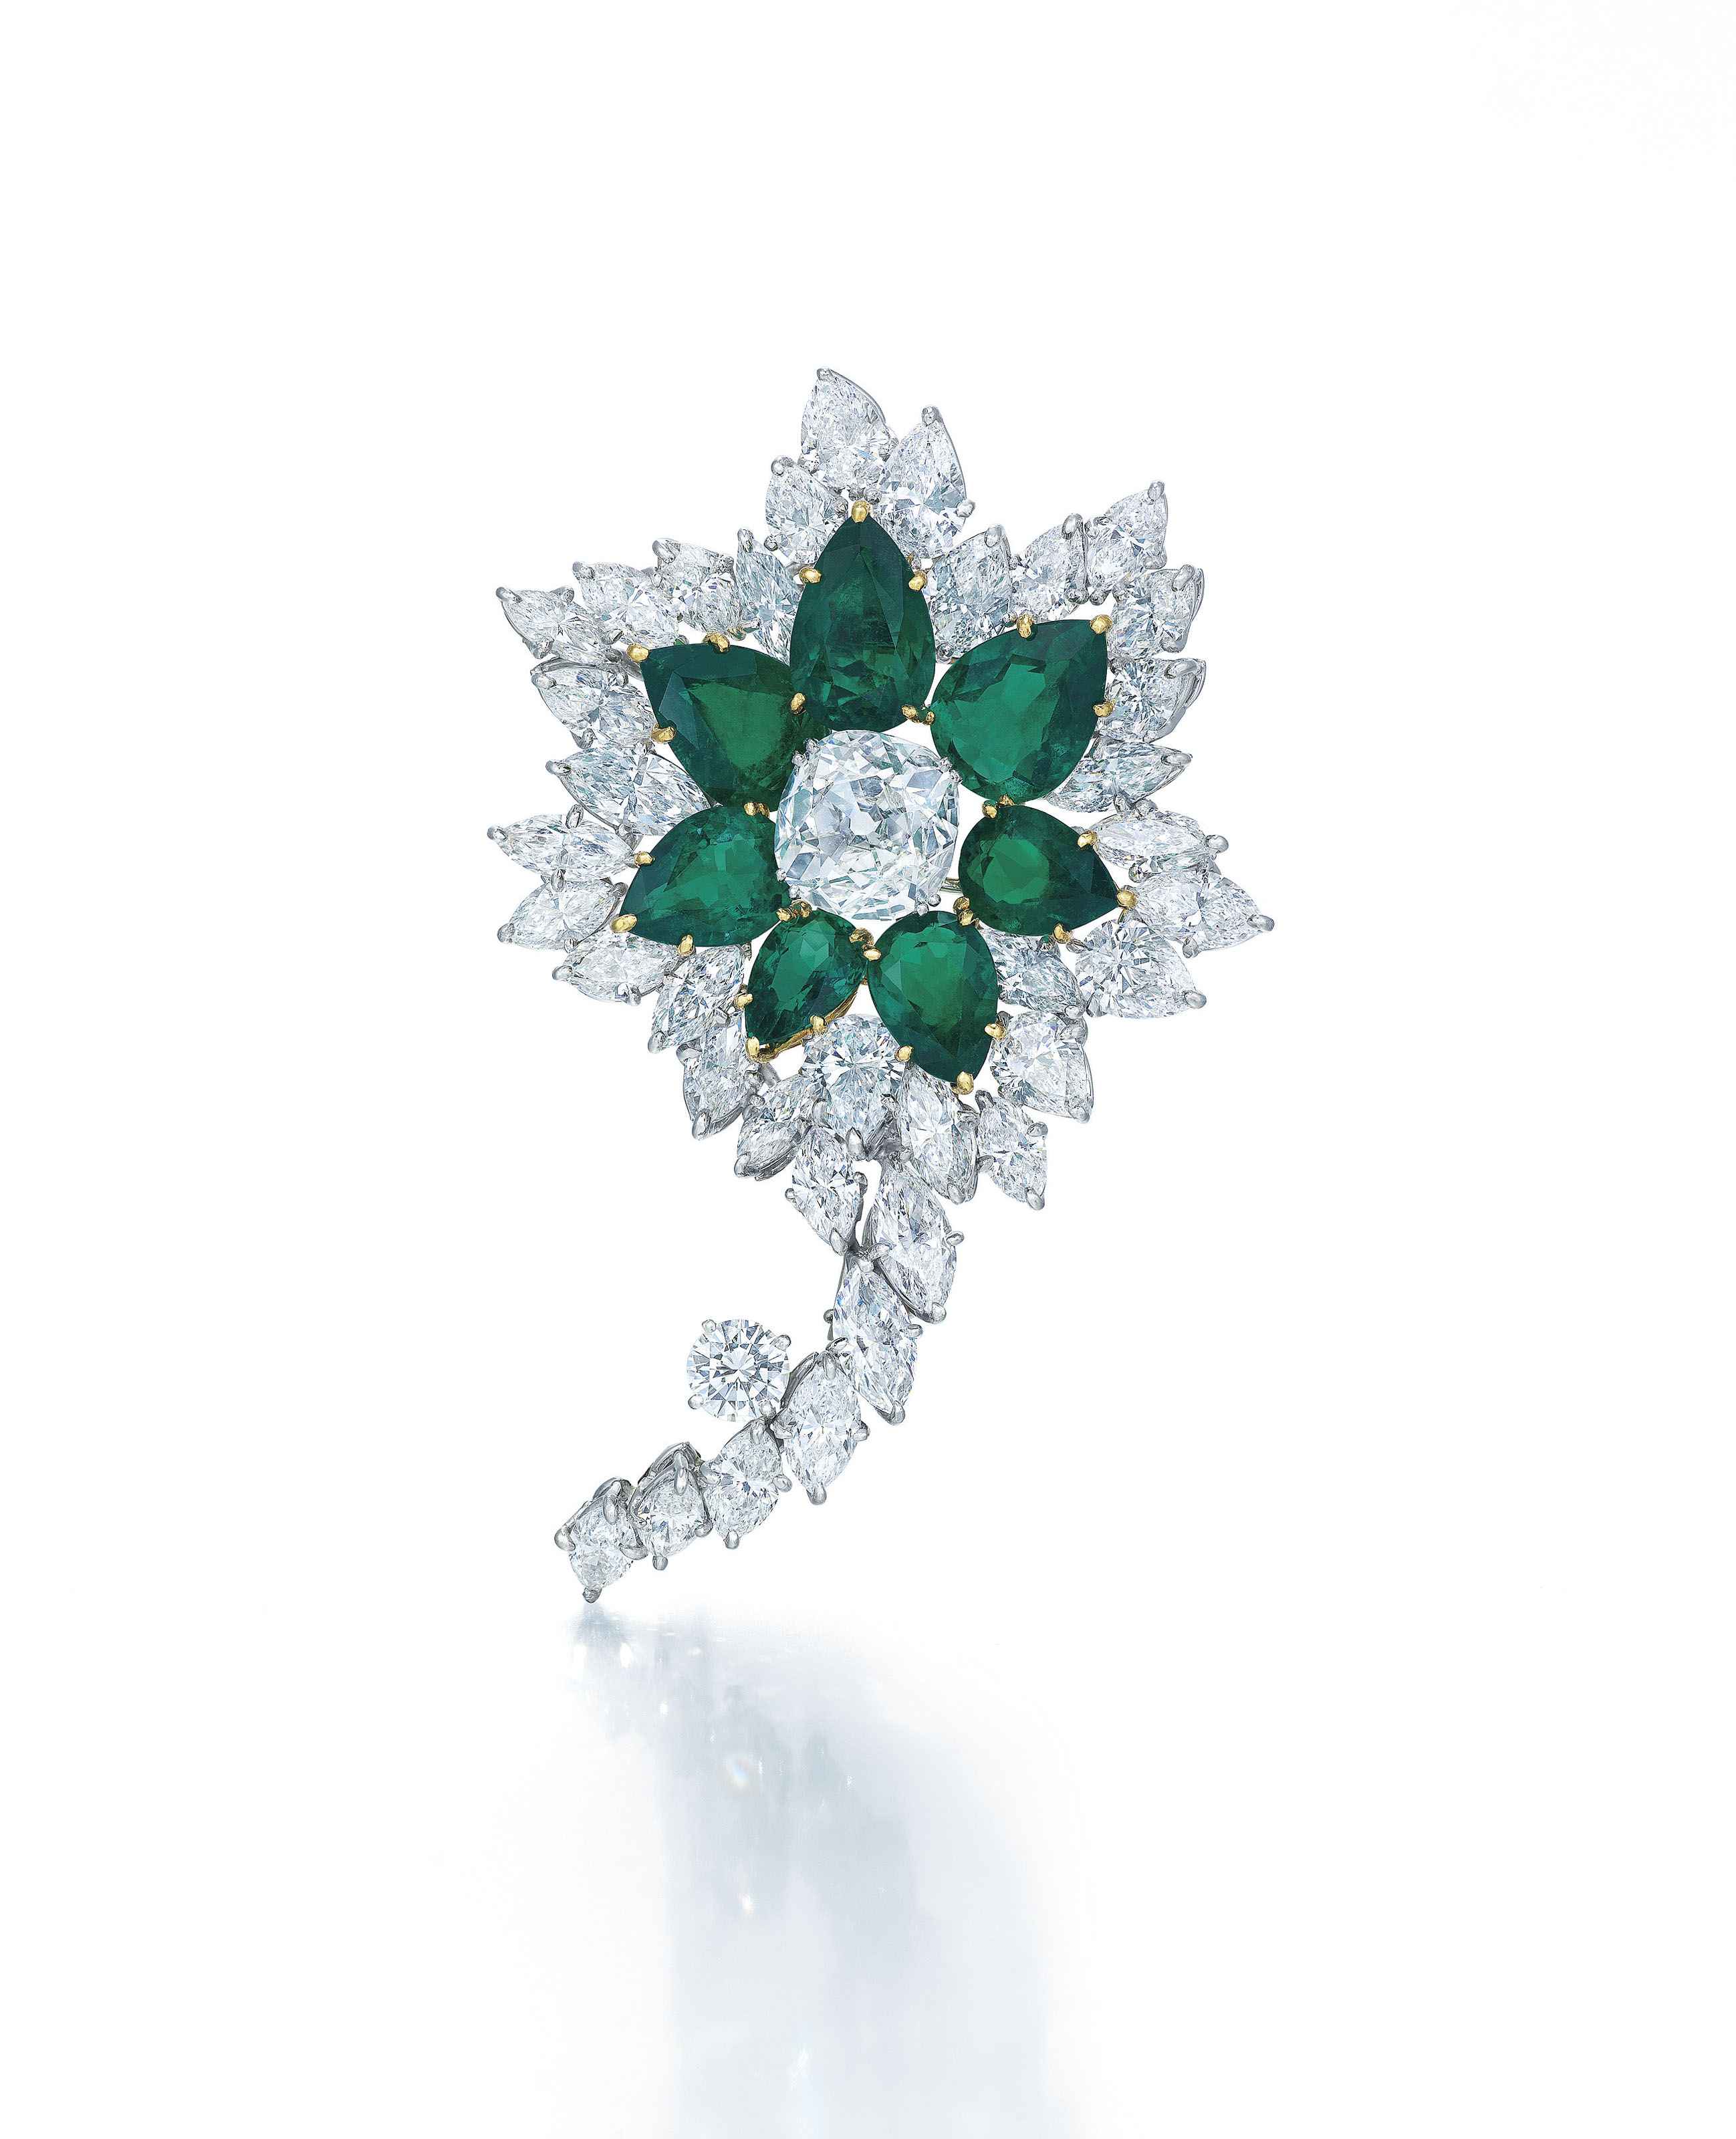 IMPORTANT DIAMOND AND EMERALD BROOCH, HARRY WINSTON